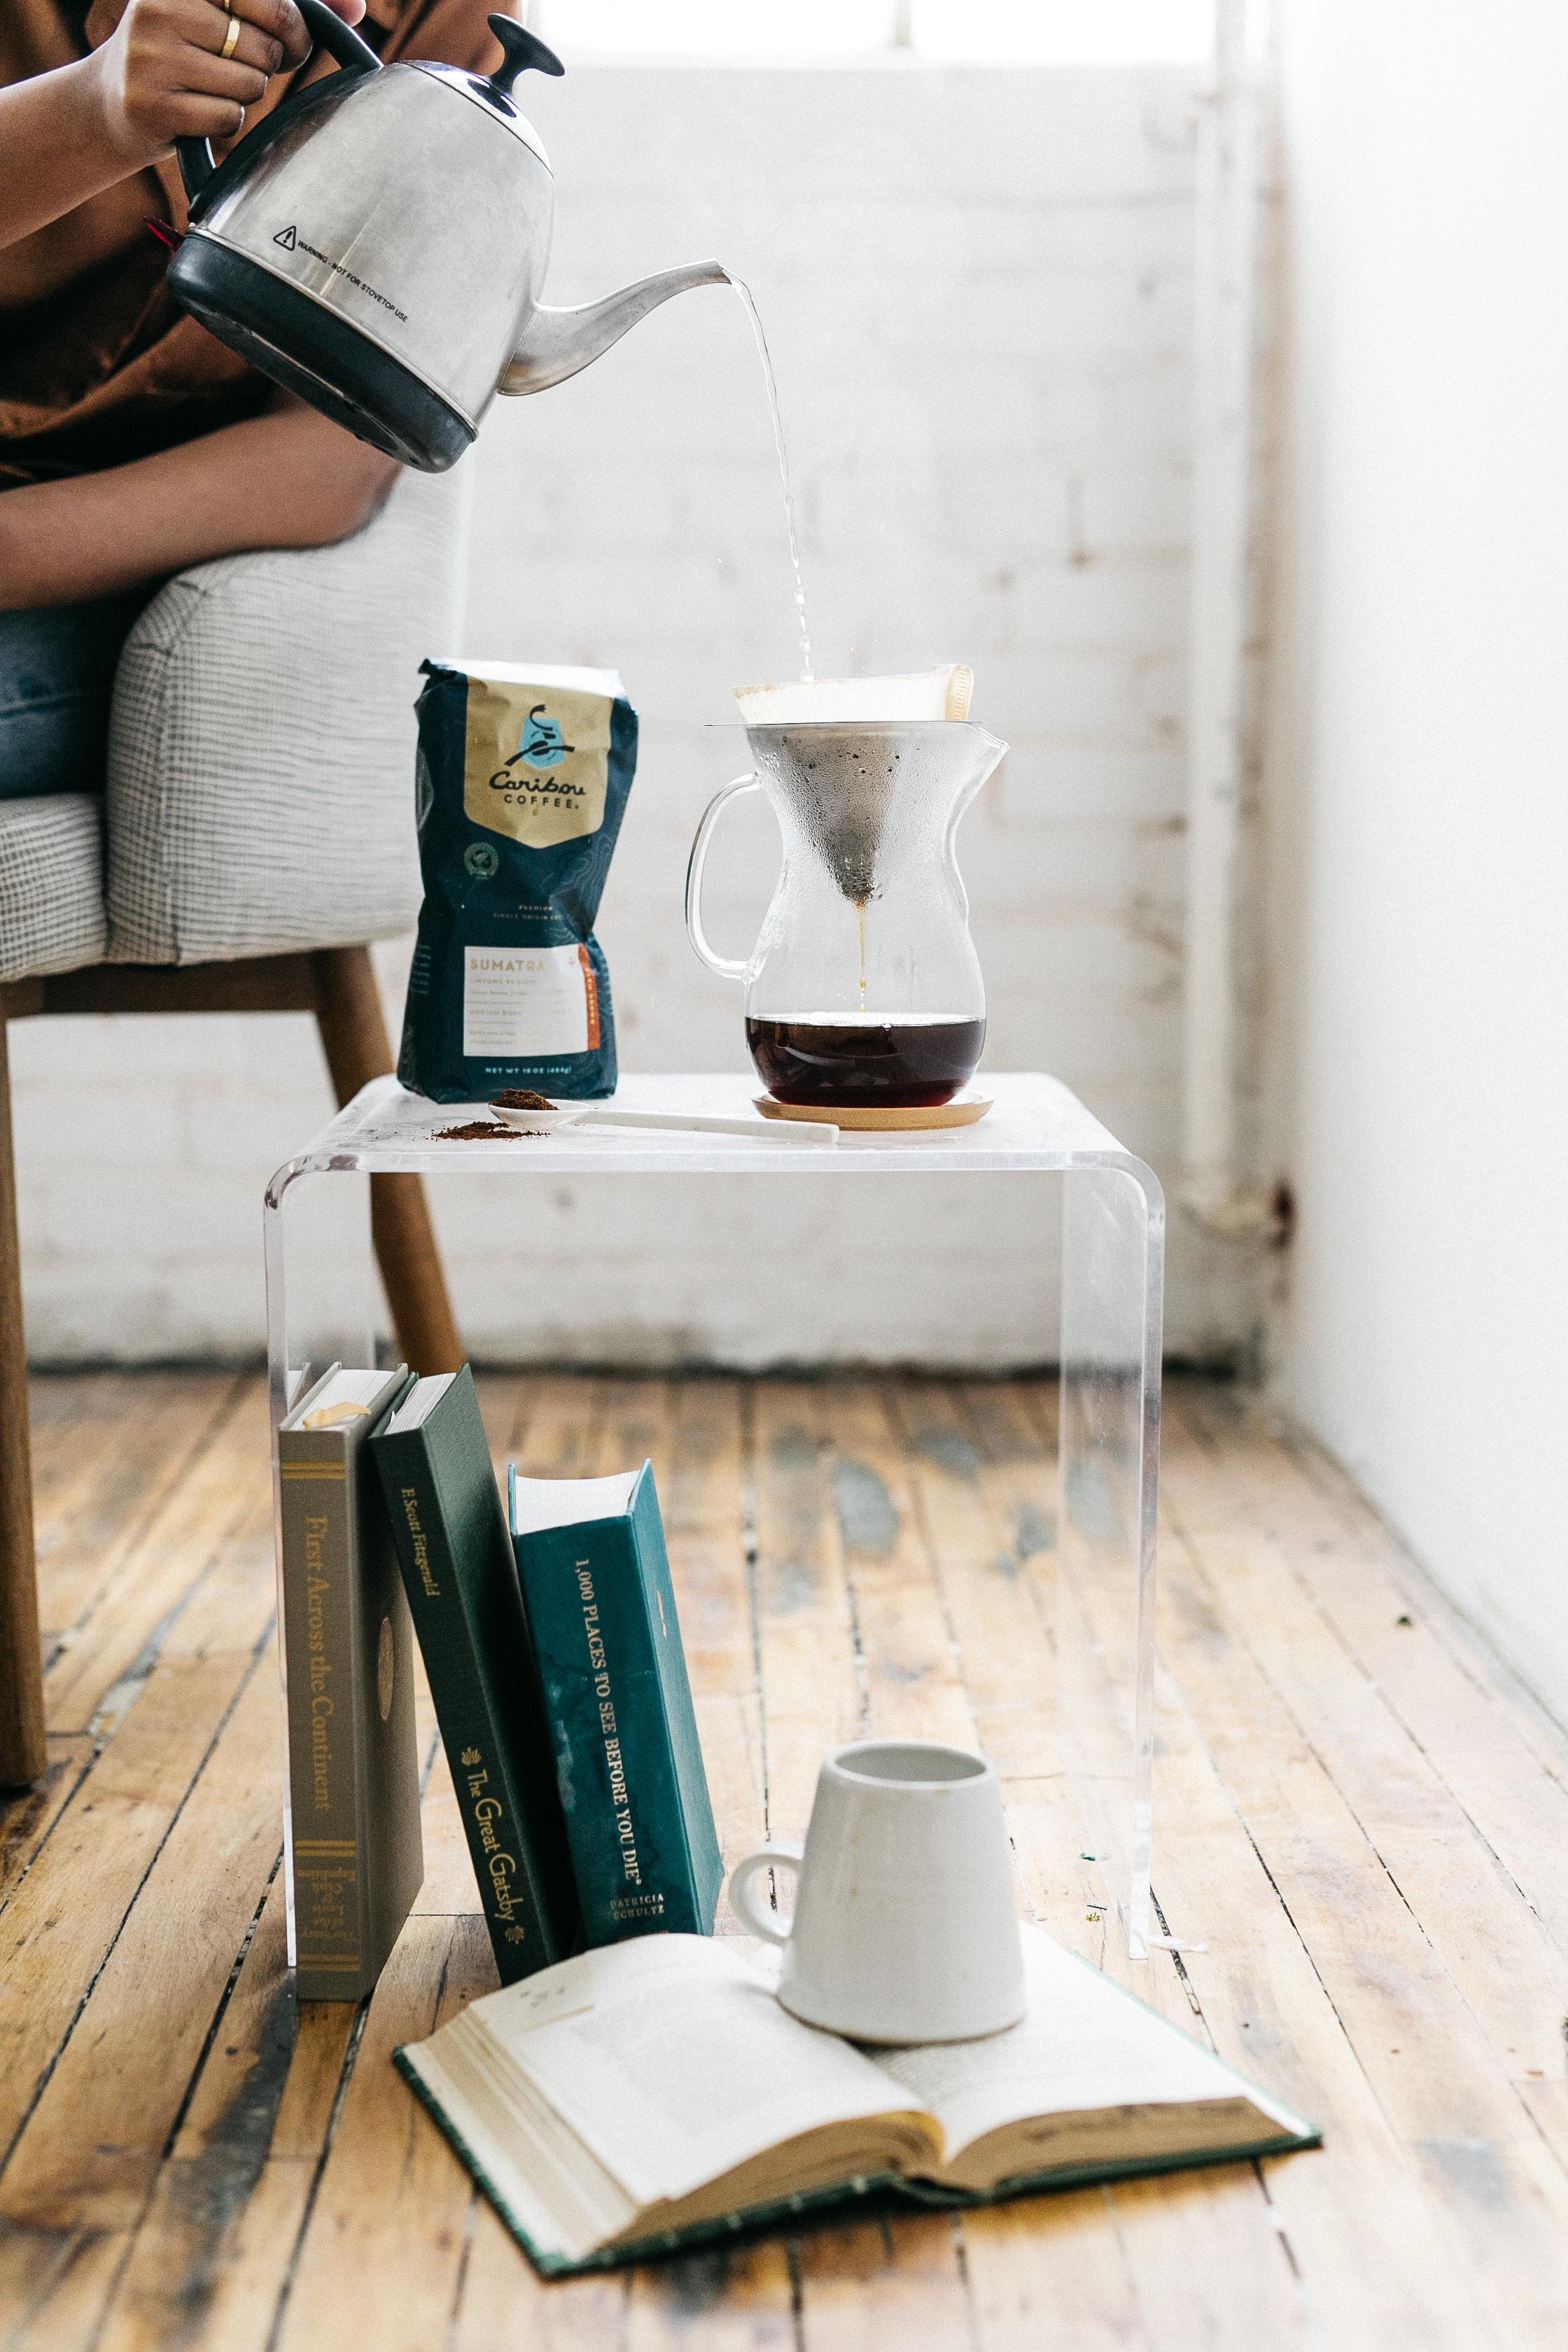 caribou coffee bethany catharine schrock bethcath marketing media lifestyle social media photograph minneapolis